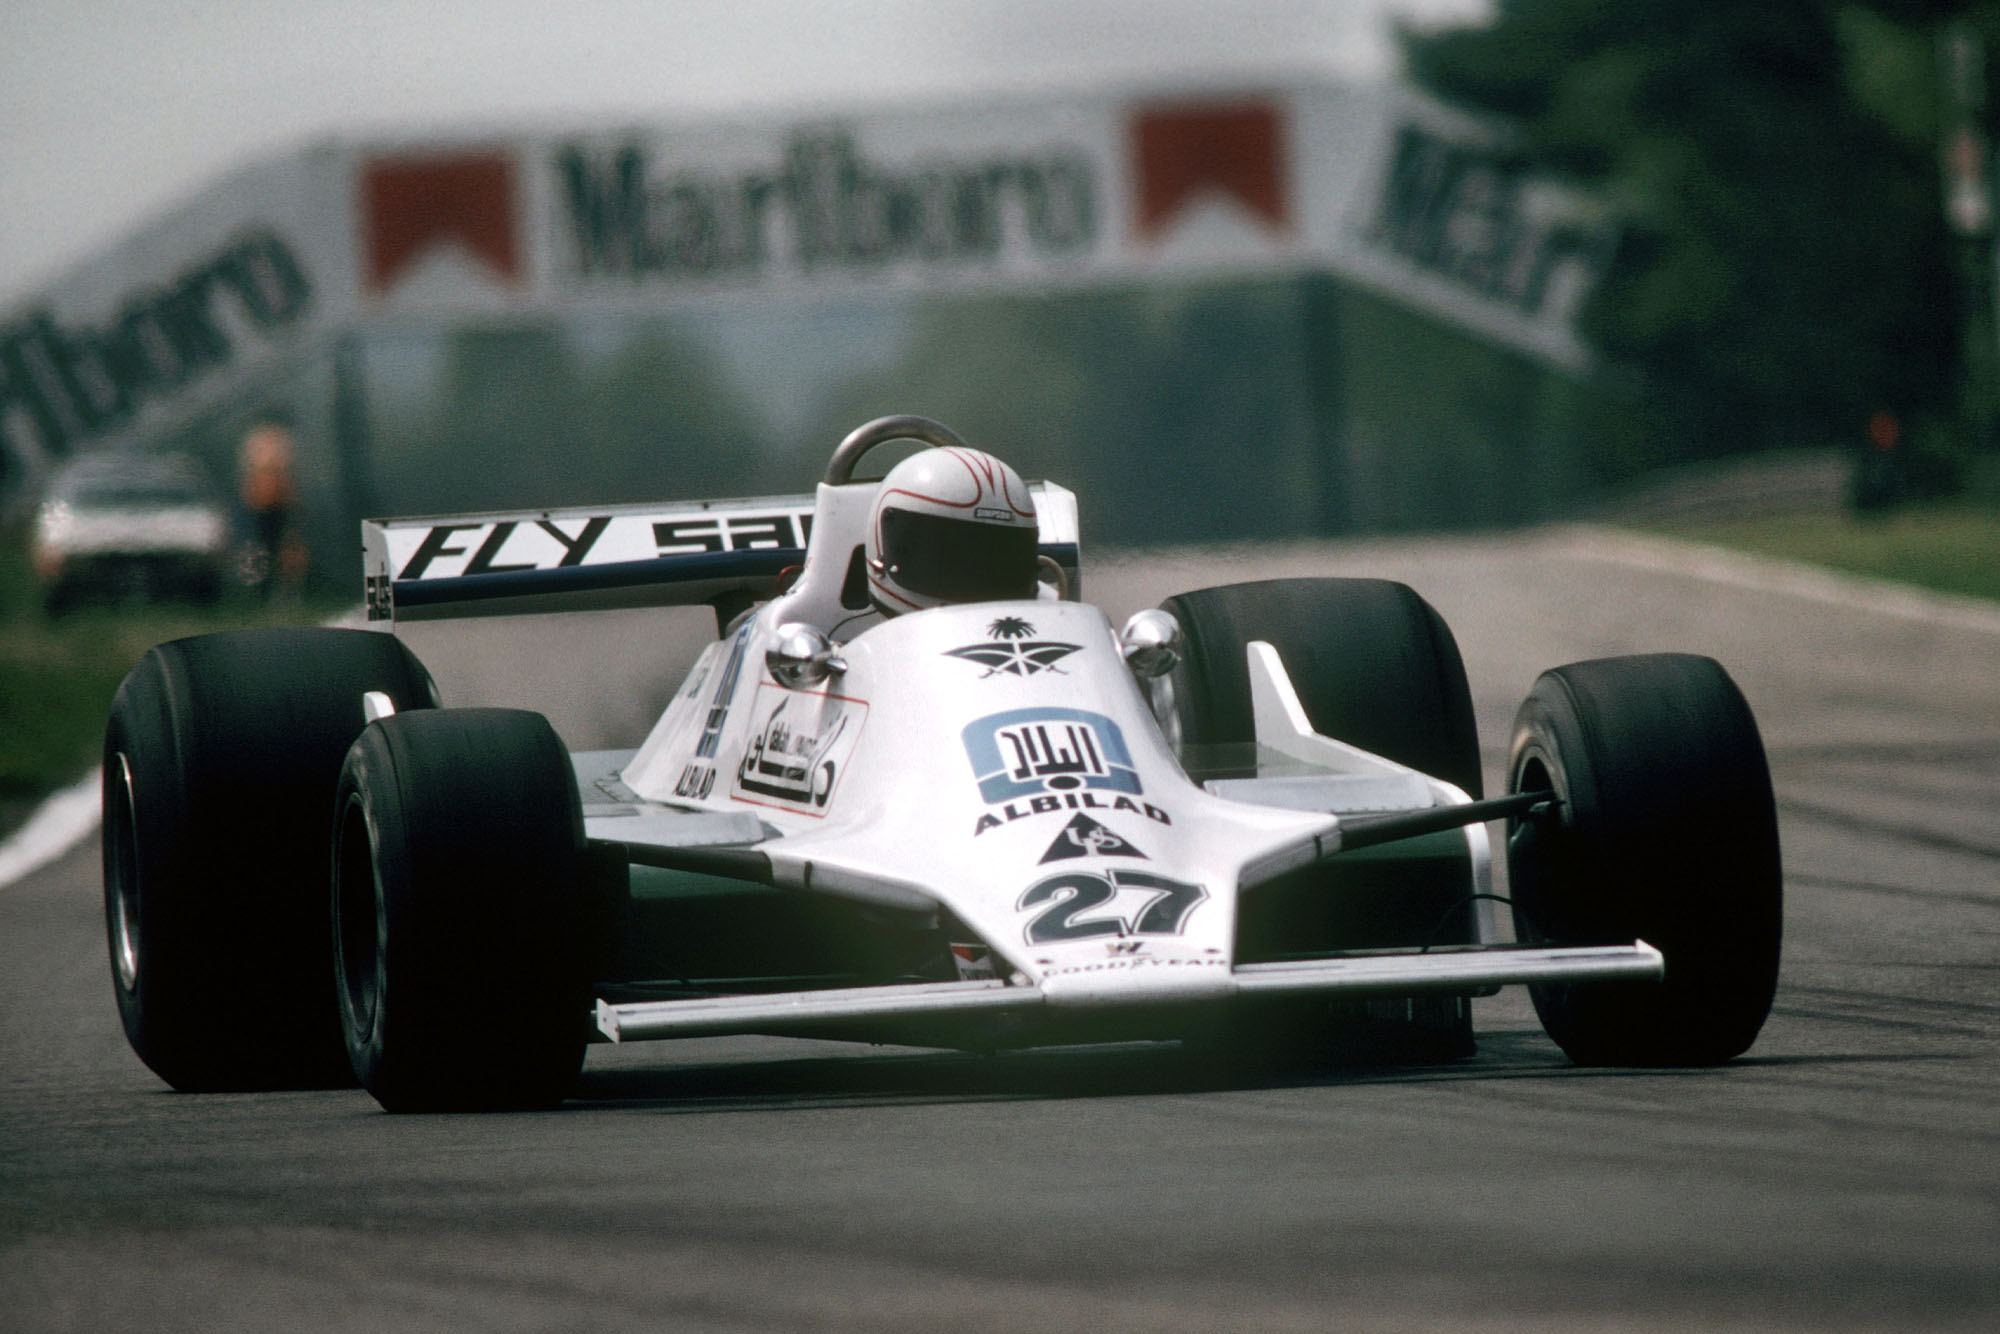 Alan Jones (WIlliams) at the 1979 Belgian Grand Prix, Zolder.